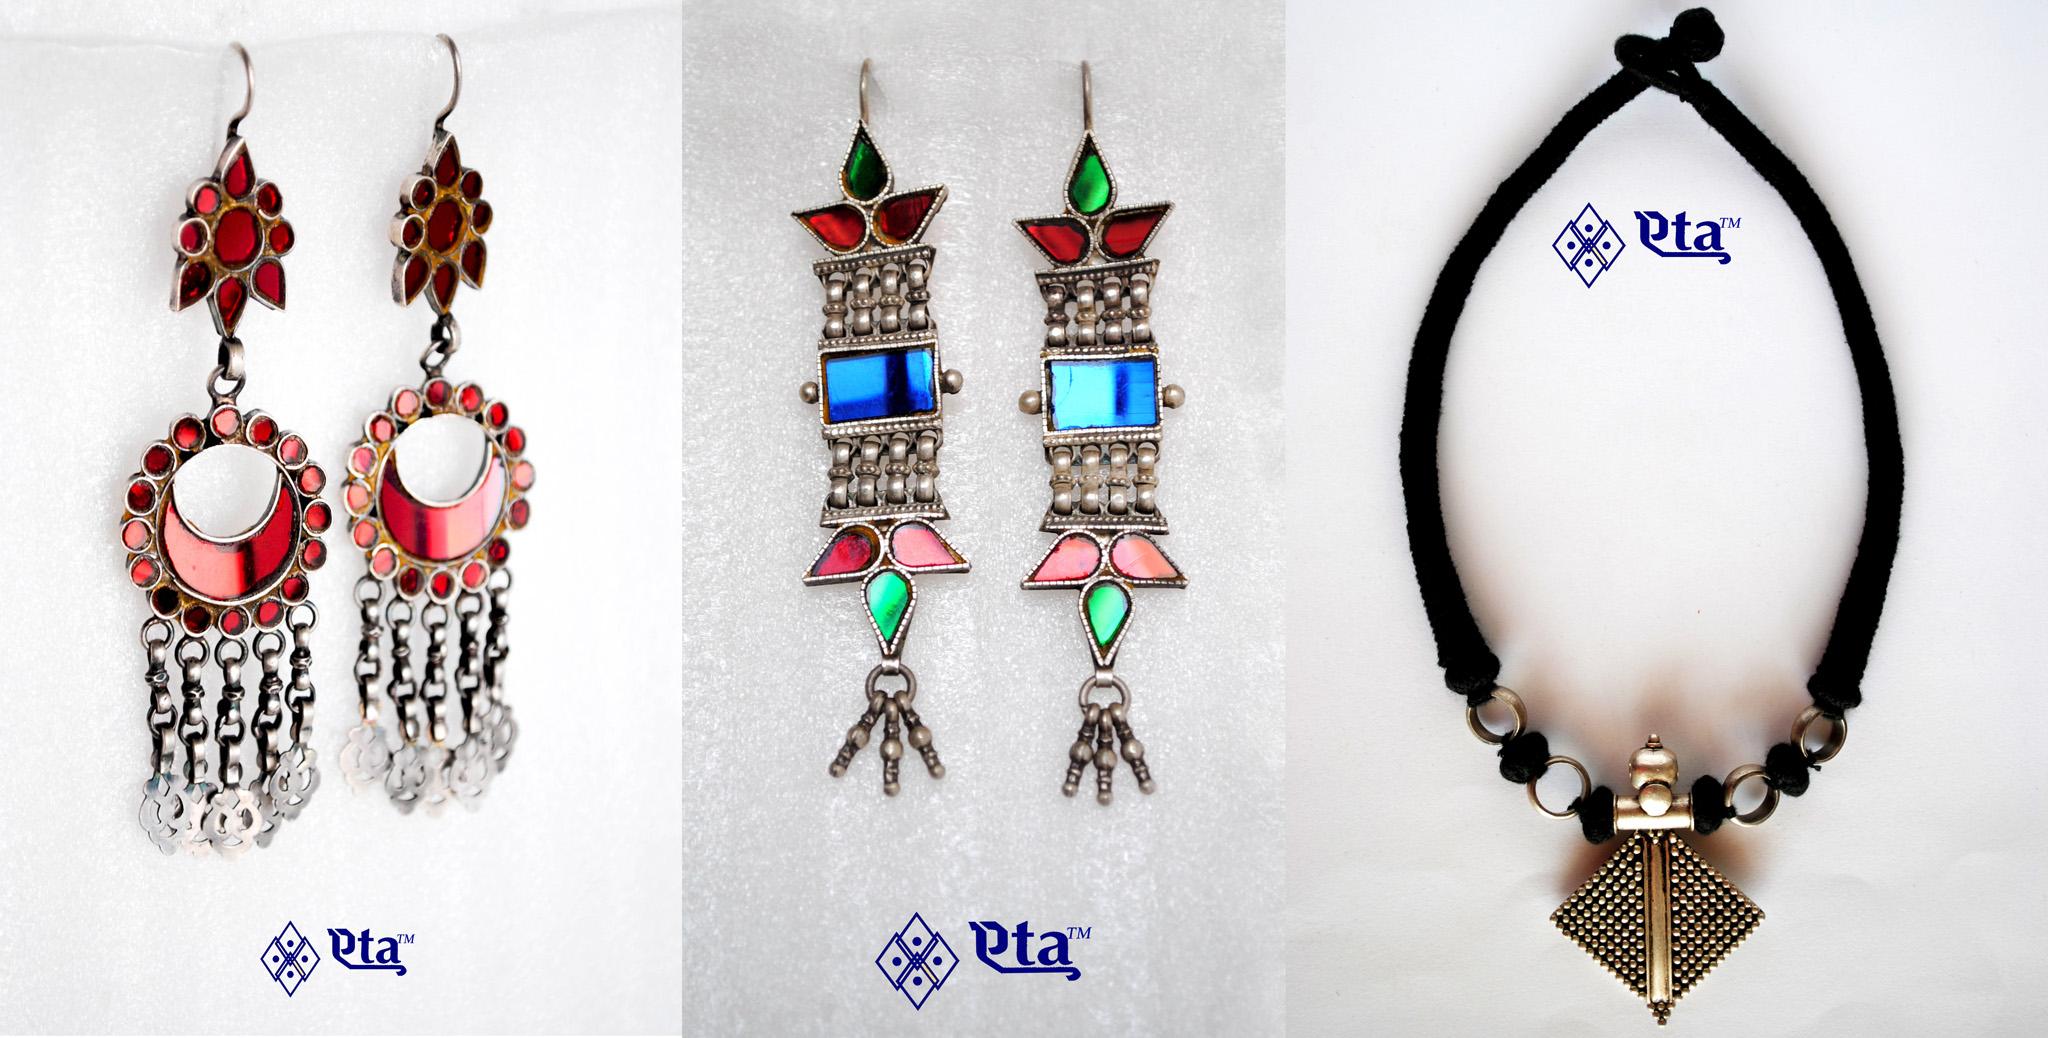 Eta Jewels & Vibrant Sky at Anay Gallery